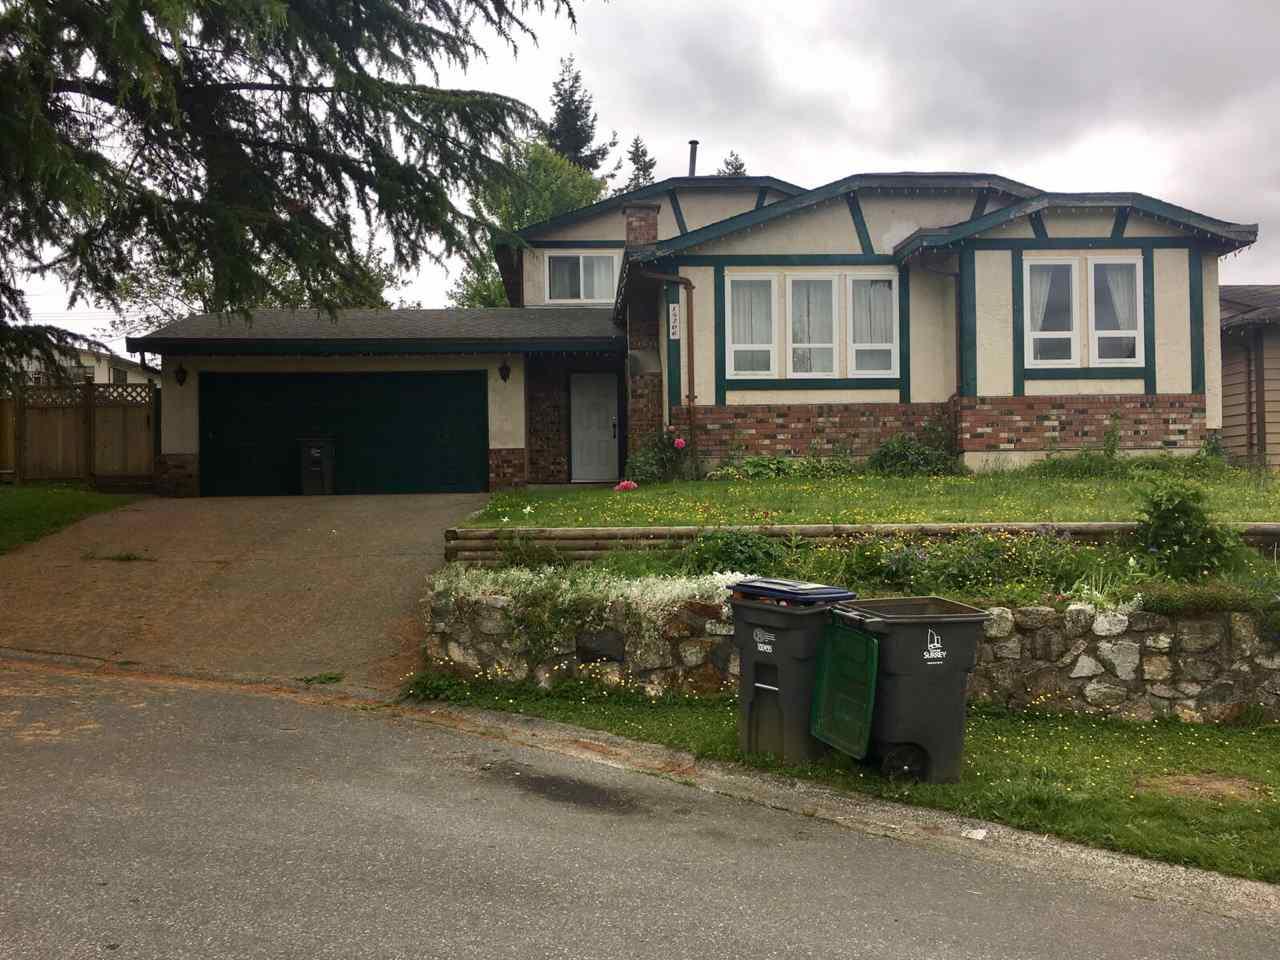 14206 72A AVENUE, Surrey, BC V3W 2R3